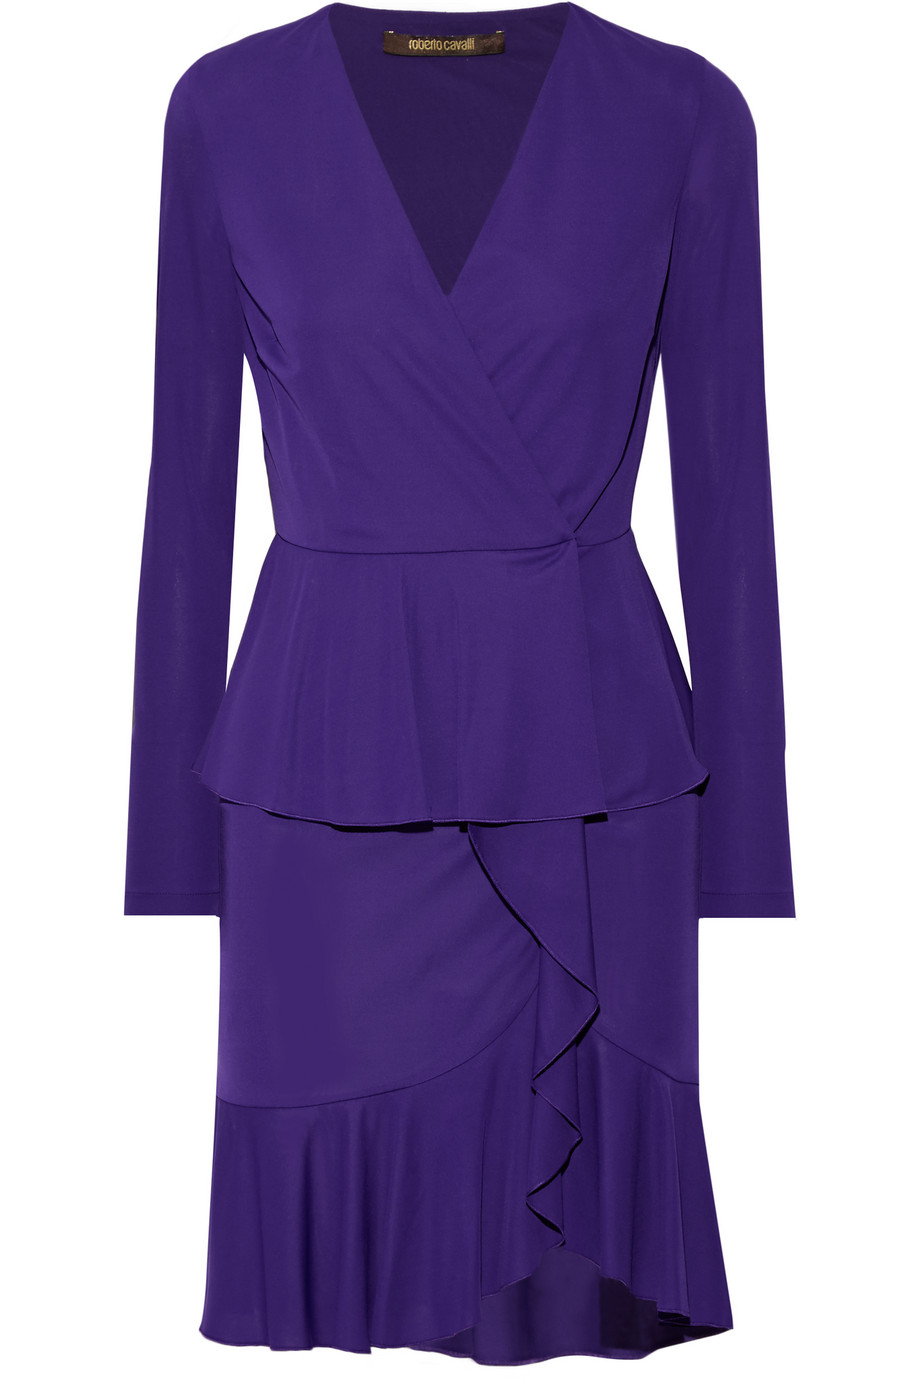 Roberto Cavalli Wrap-Effect Ruffled Stretch-Jersey Mini Dress, Dark Purple, Women's, Size: 40